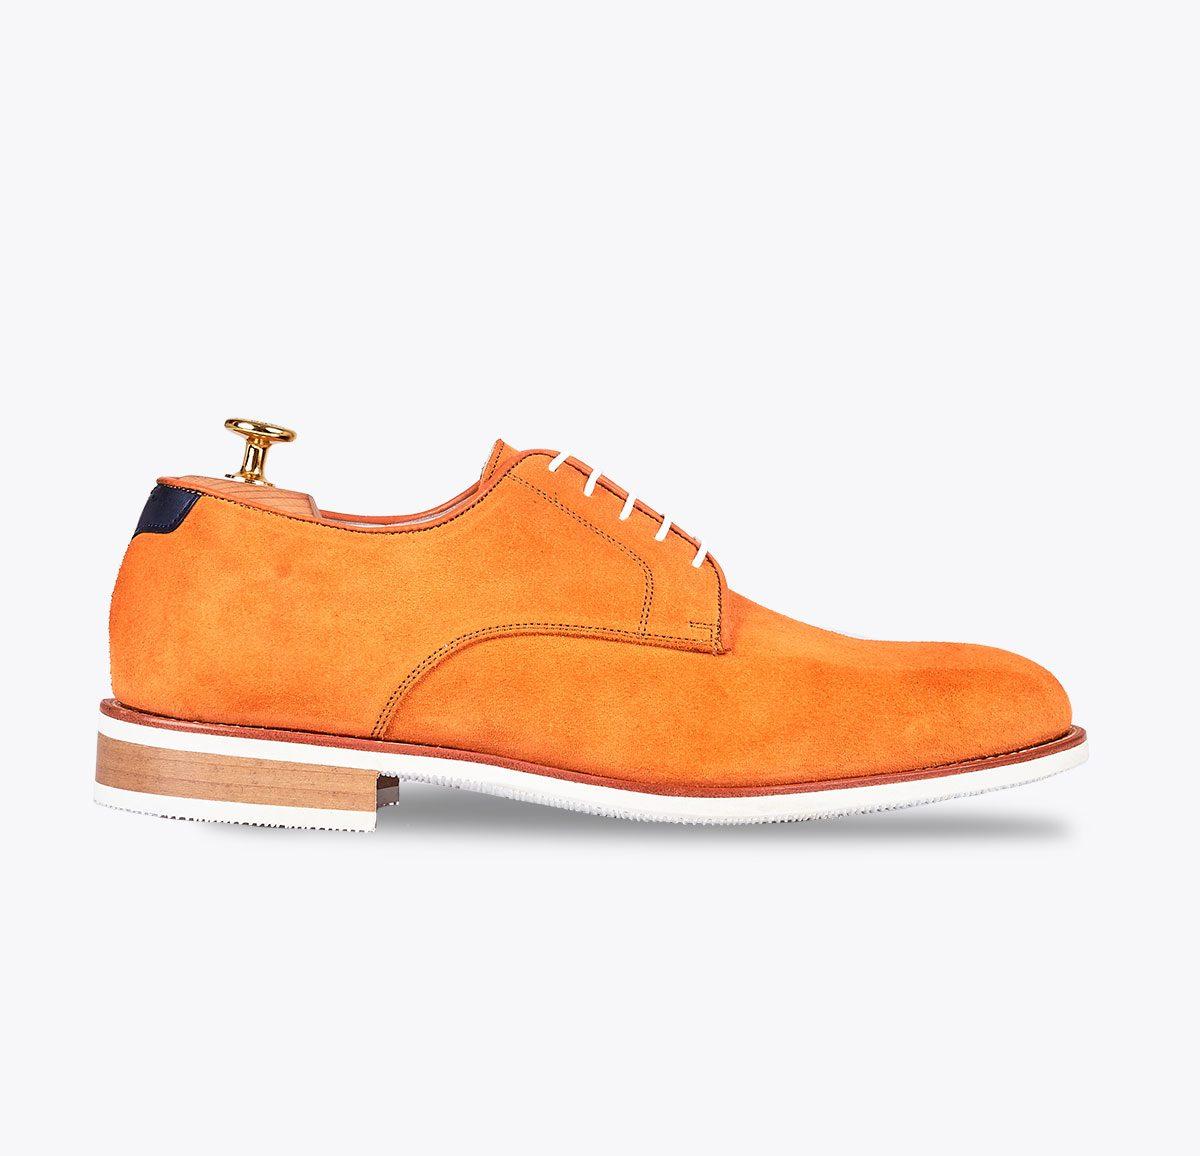 Zapato summer 1 mandarina hecho a mano en mandalashoes, Santanyí Mallorca. Hand made shoes. Nach Mass Schuhe